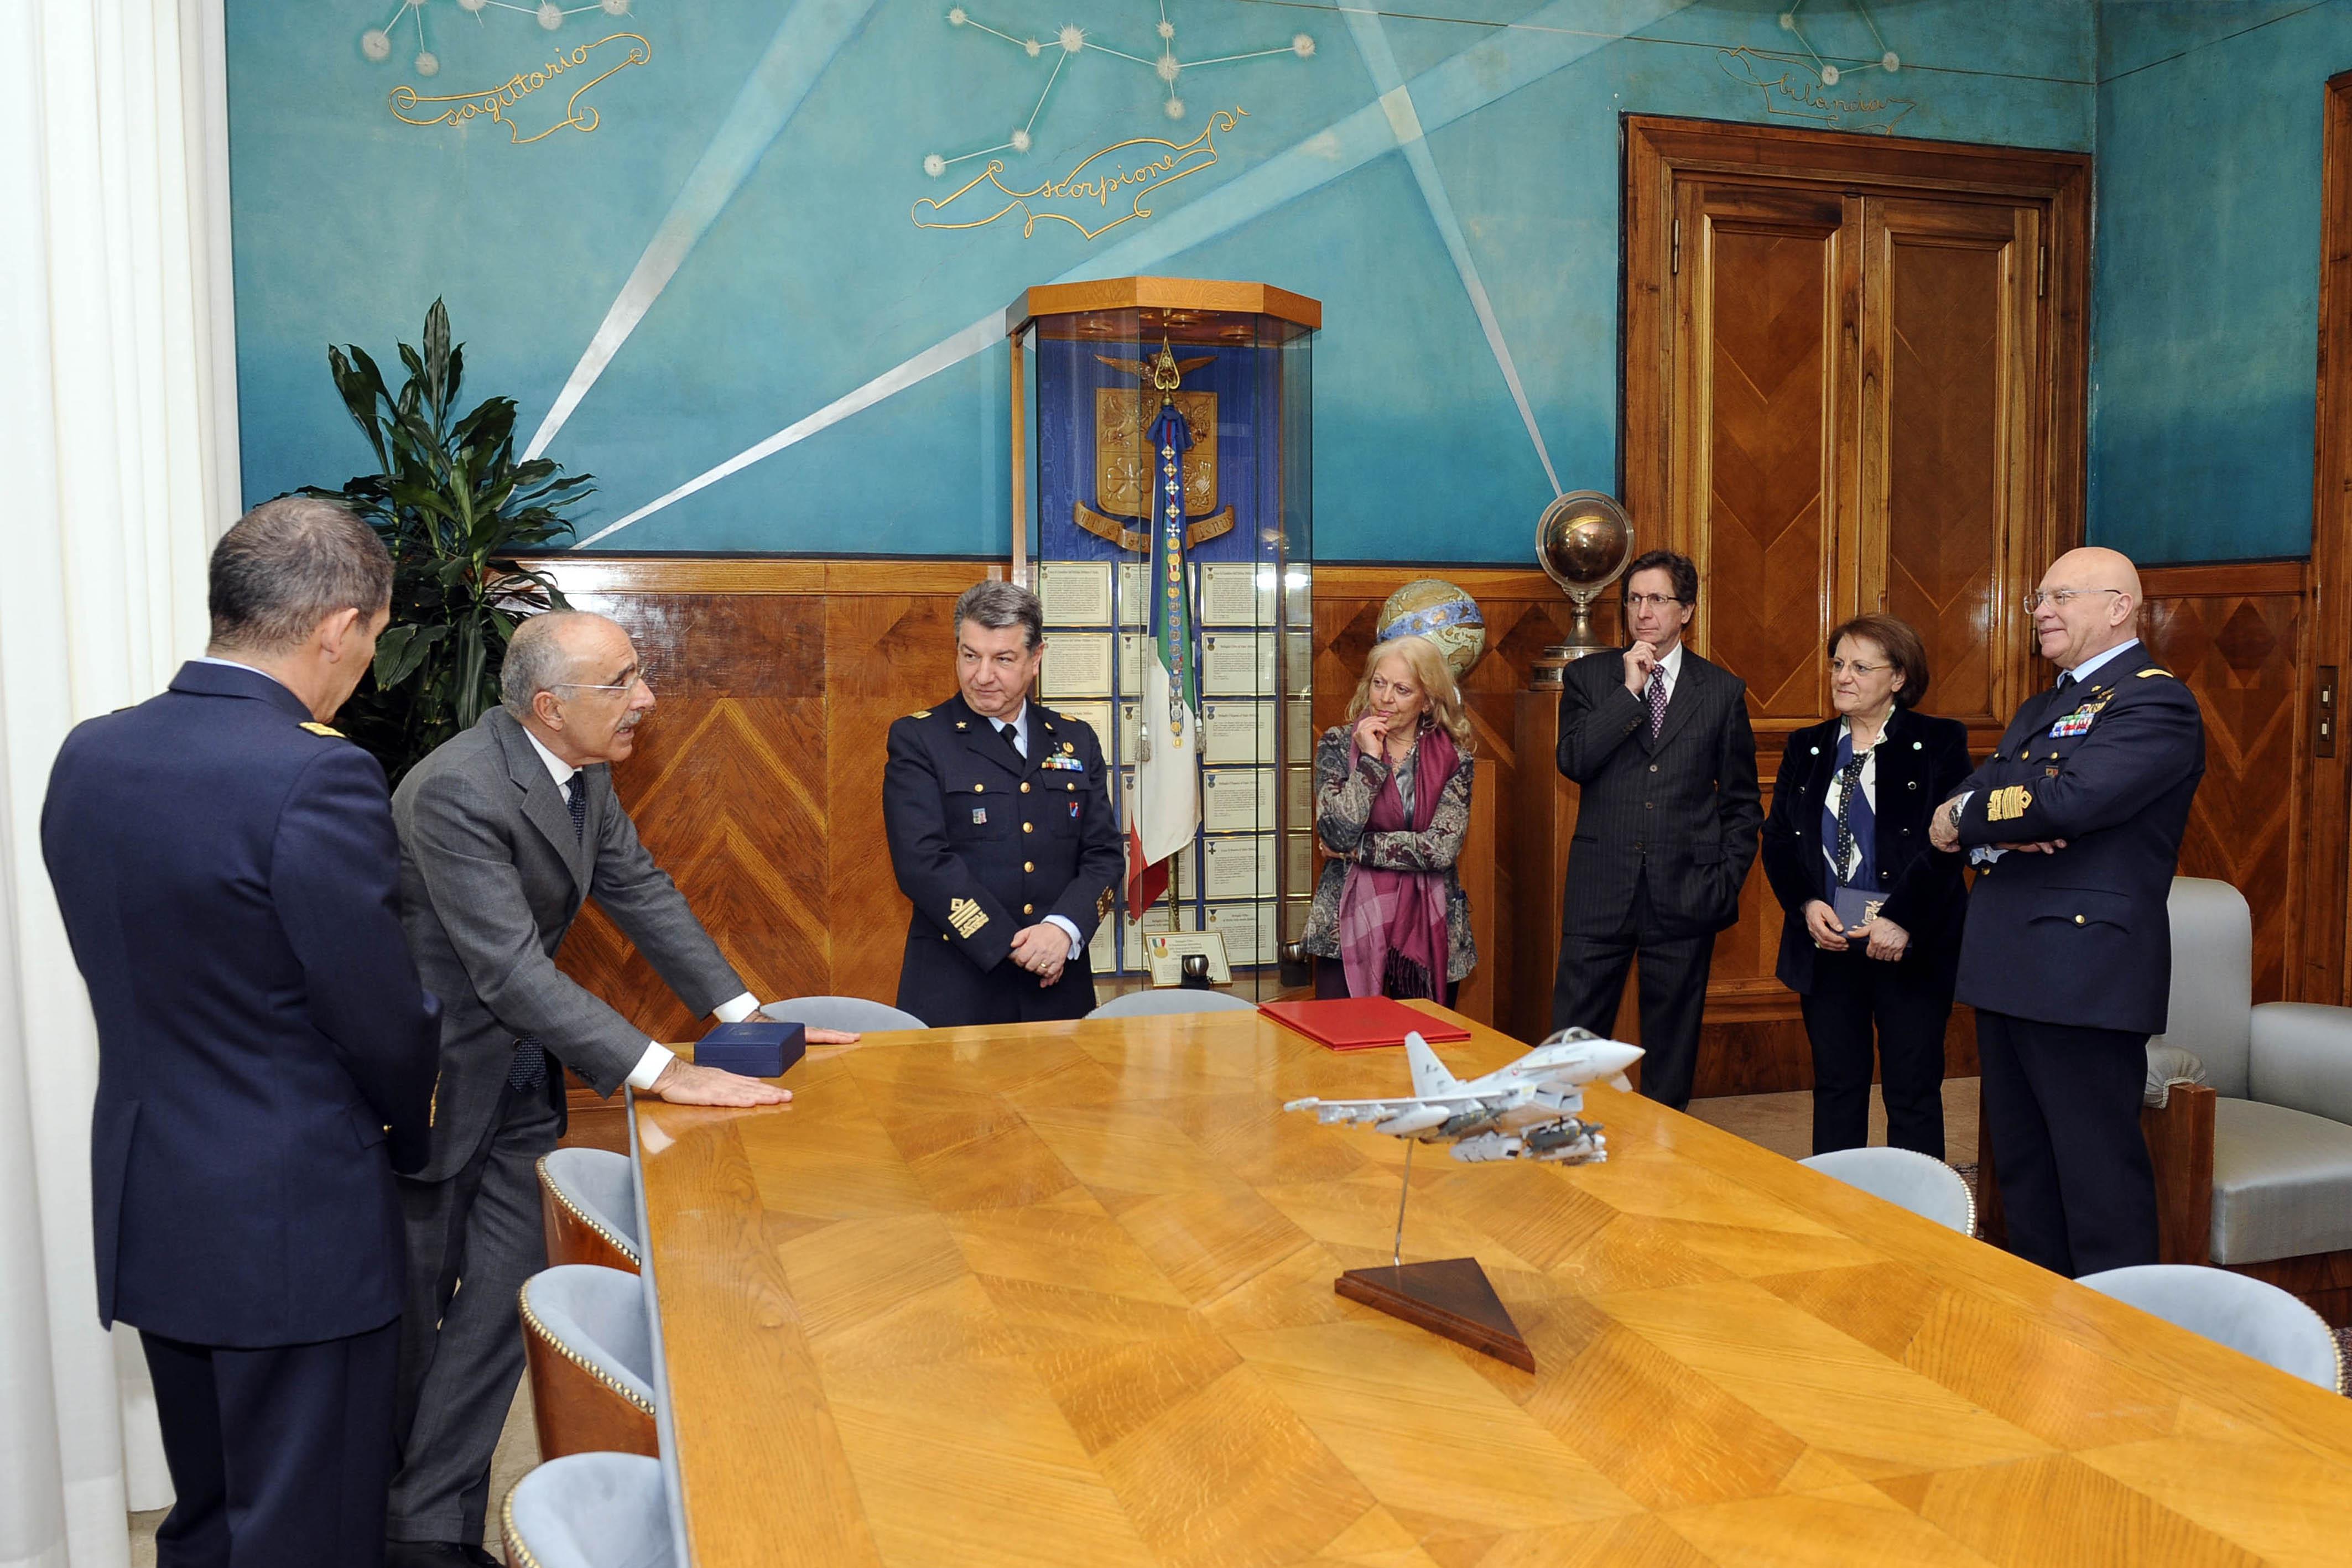 M-346 - assinatura contrato 9 exemplares 18mar2016- foto Forca Aerea Italiana